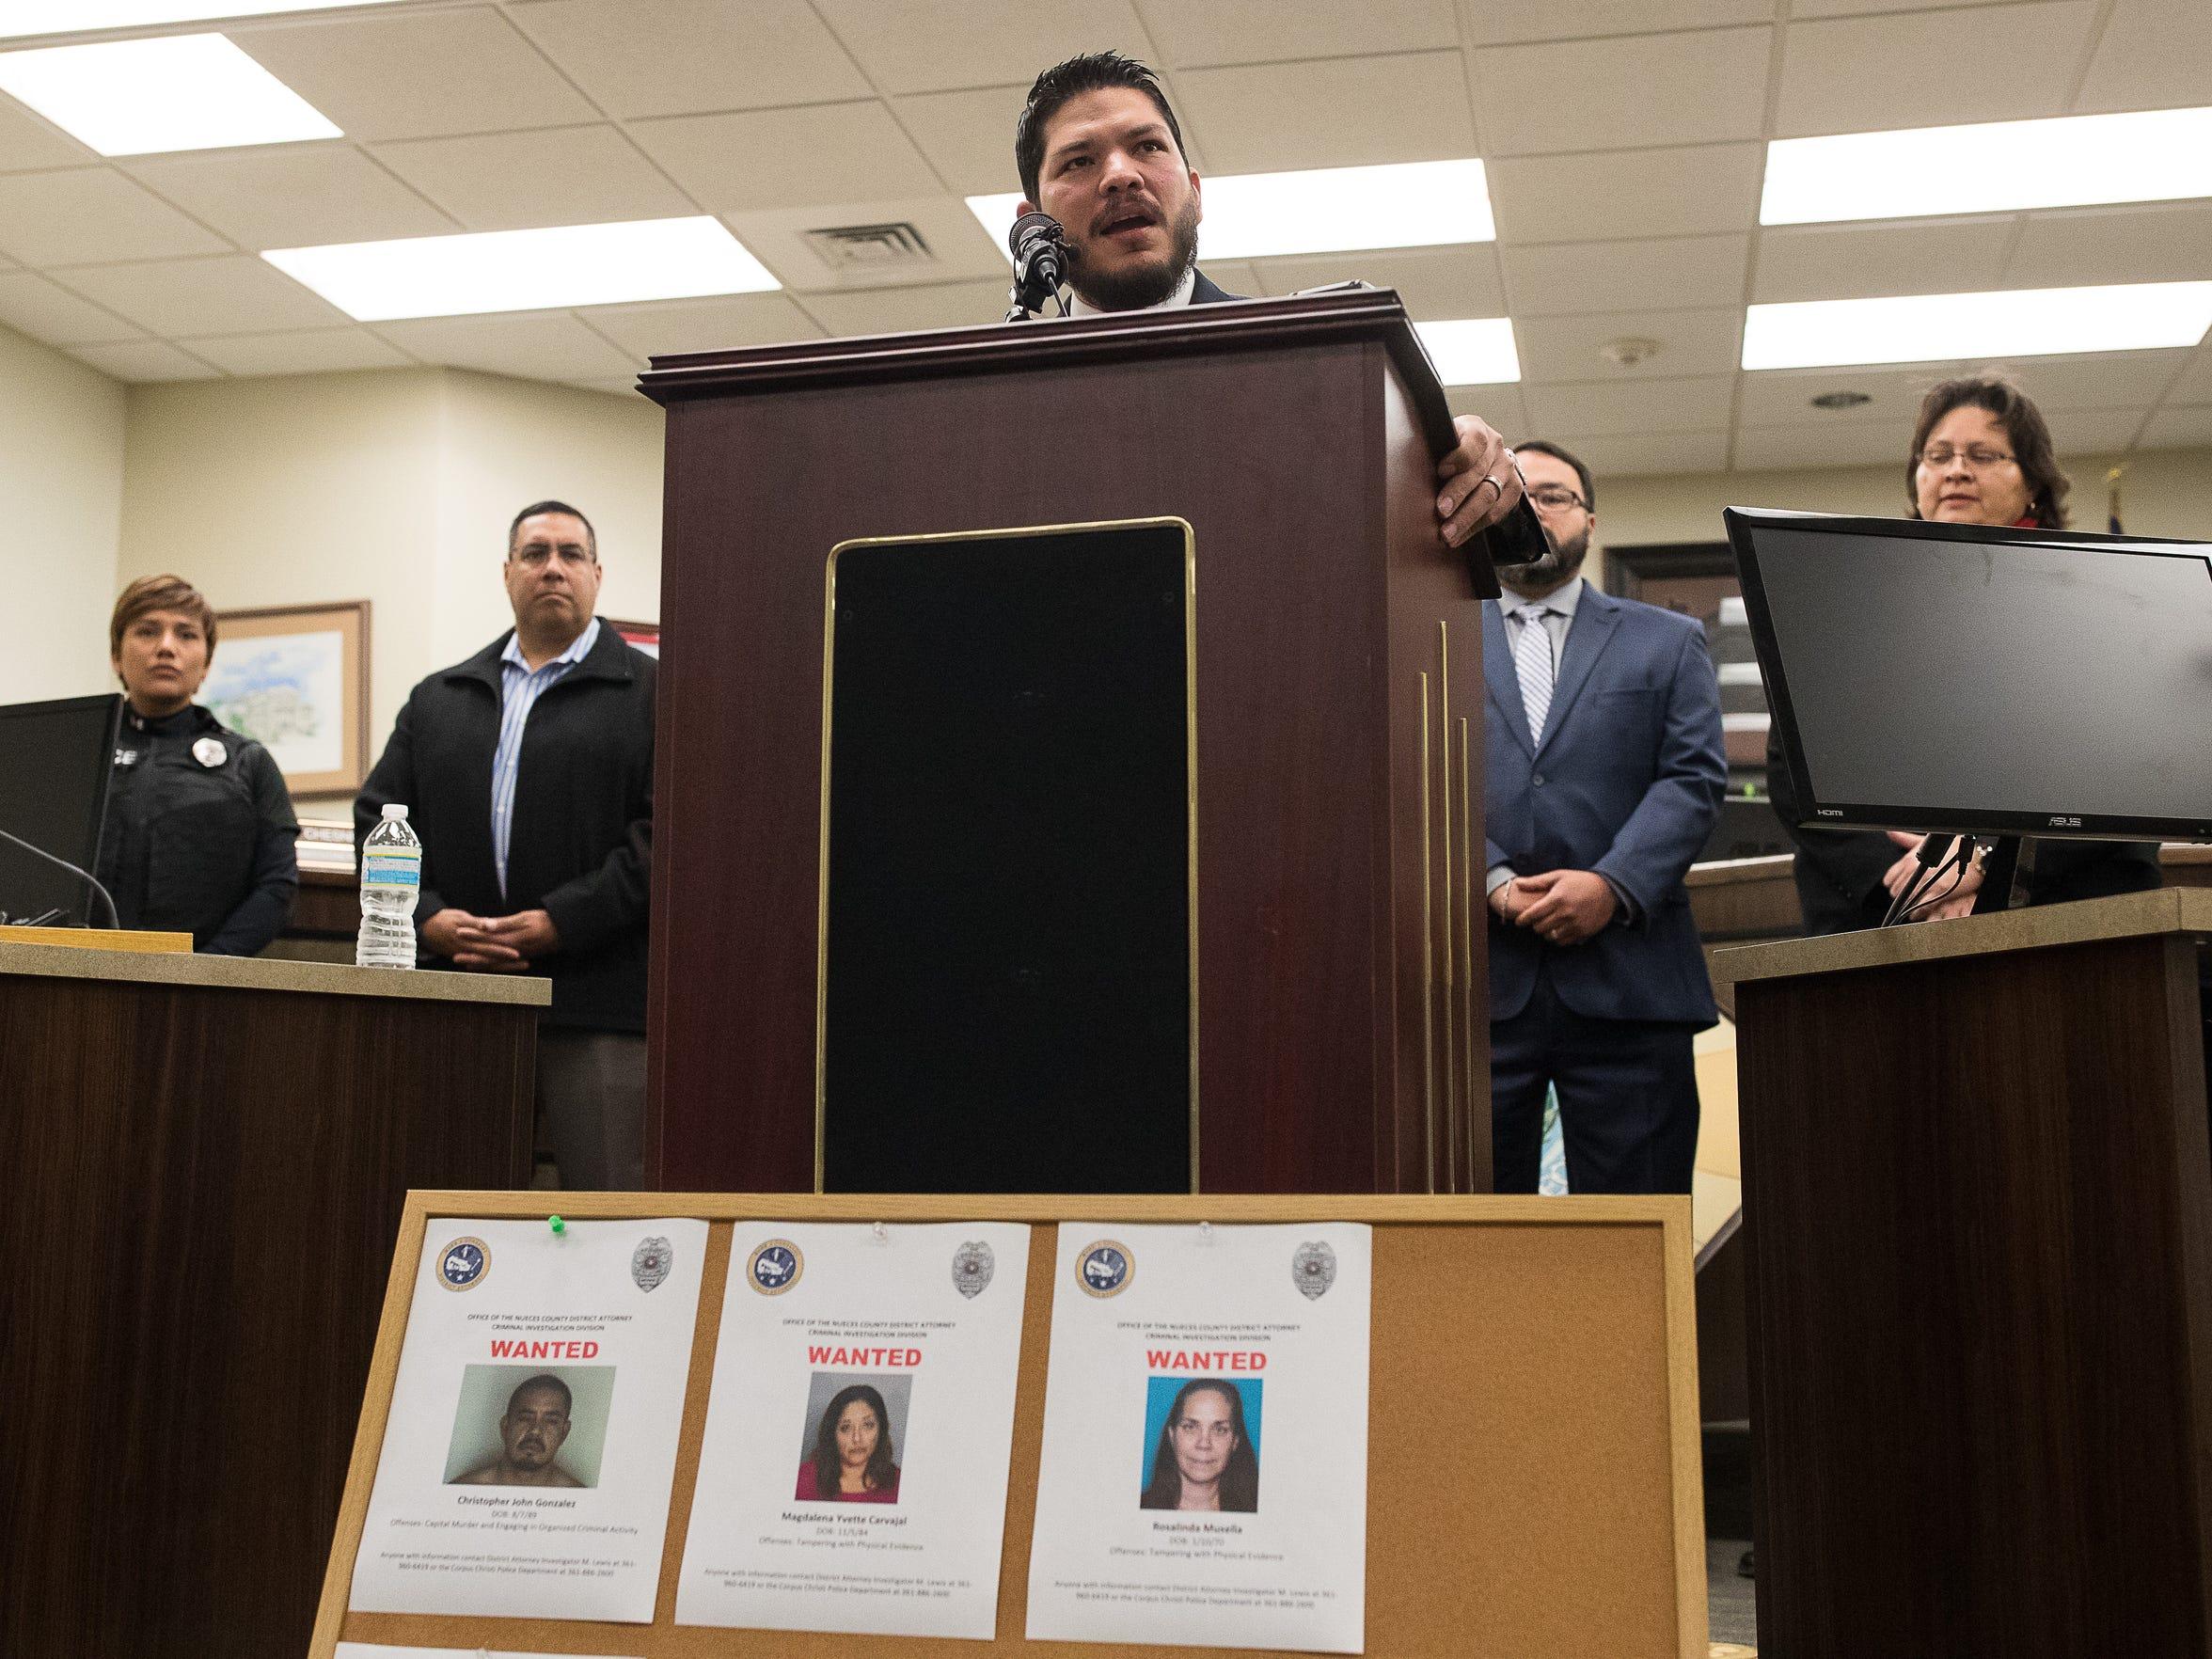 Nueces County District Attorney Mark Gonzalez announced